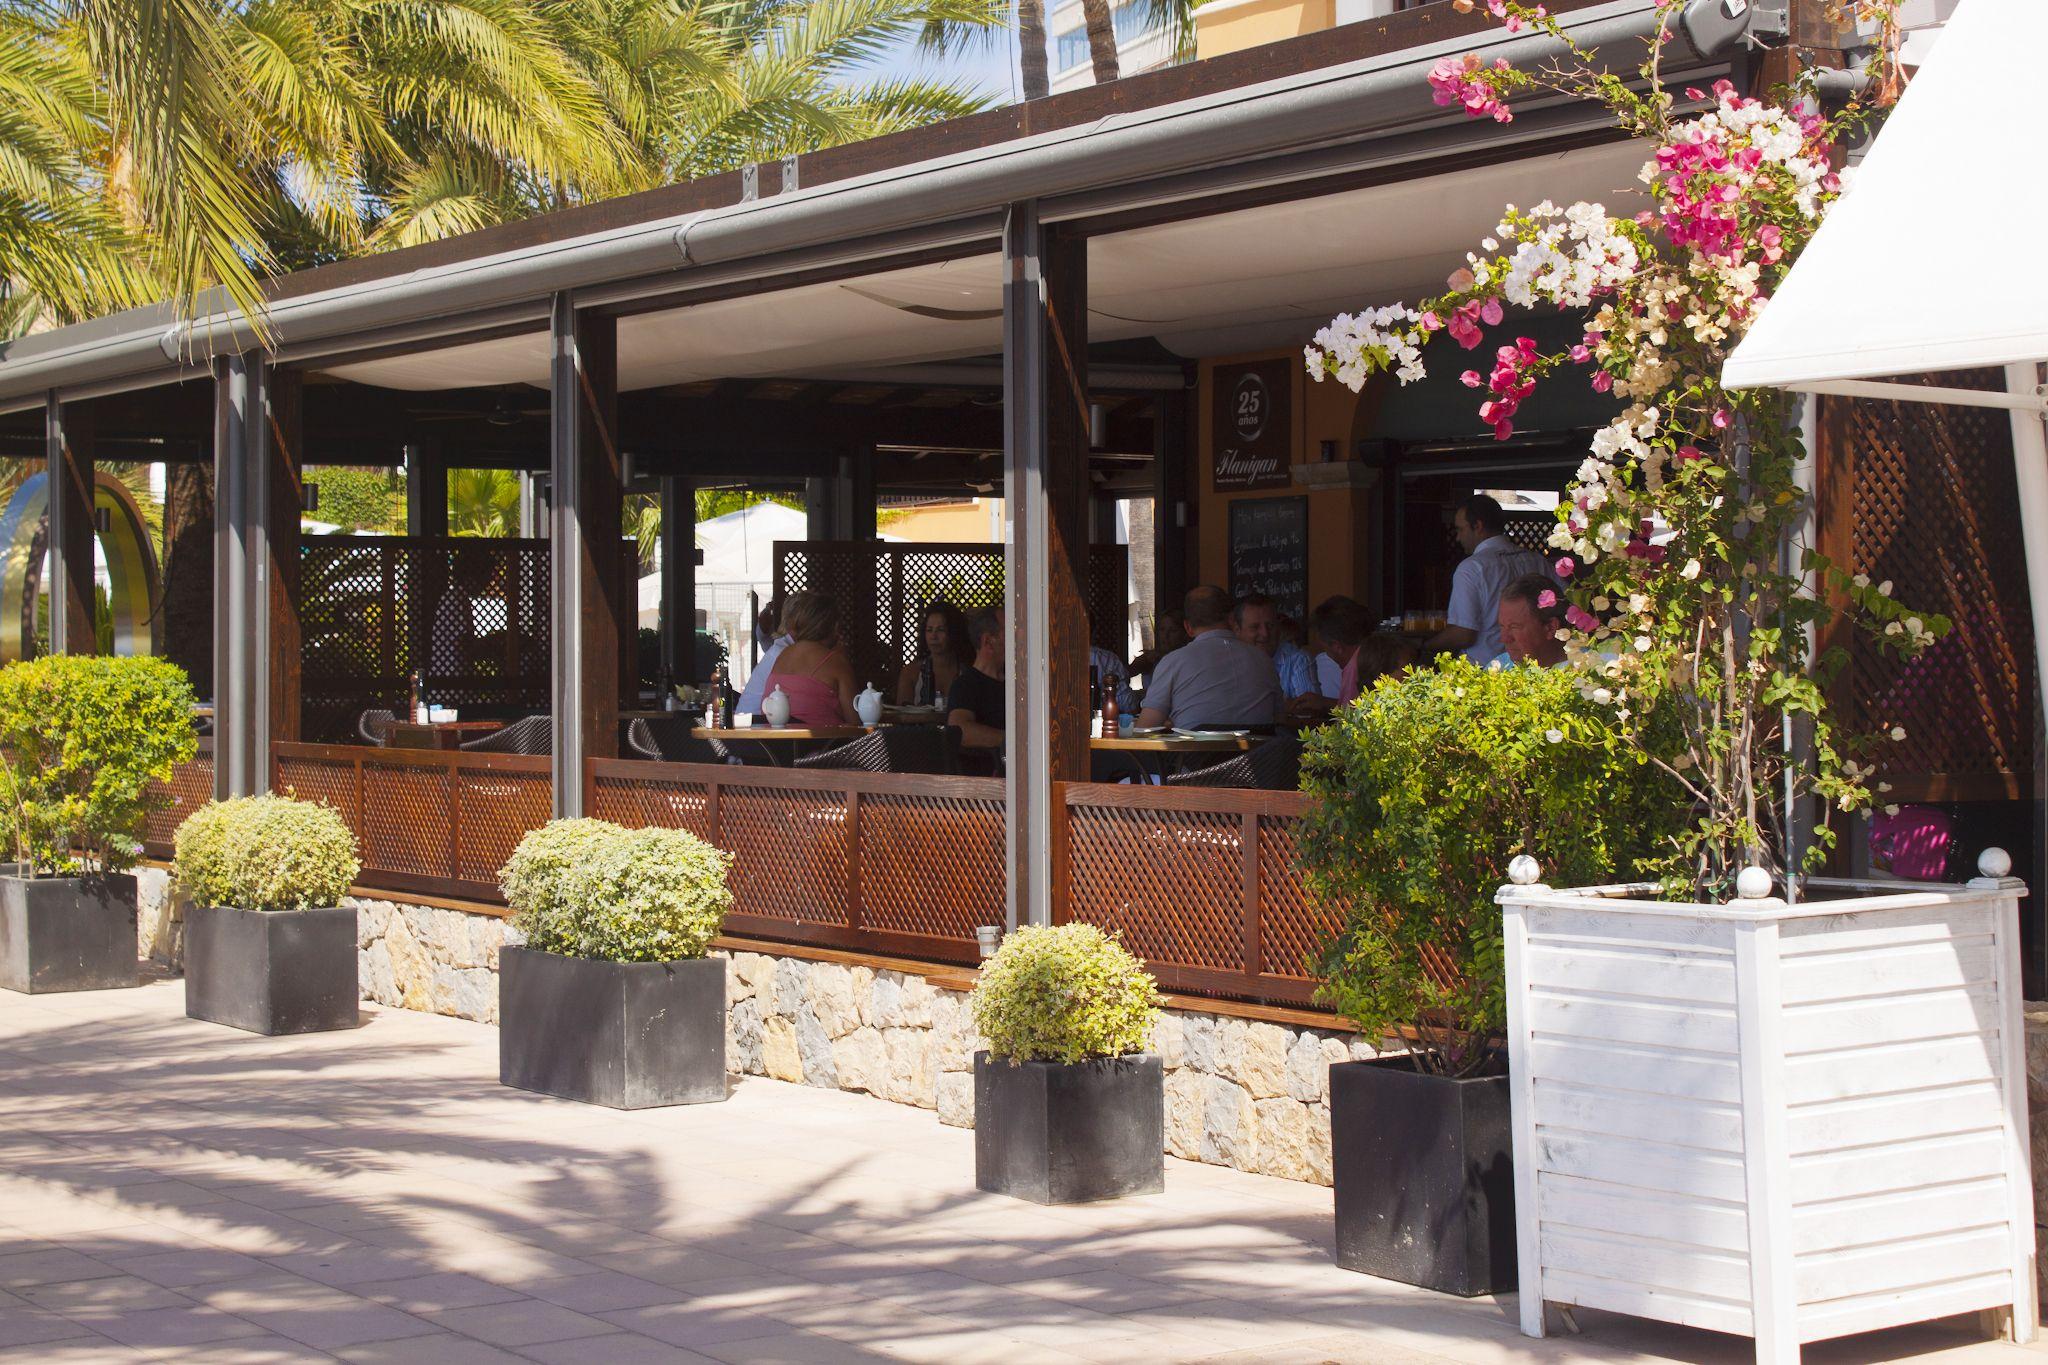 Restaurant in Puerto Portals Mallorca Mallorca, Pergola